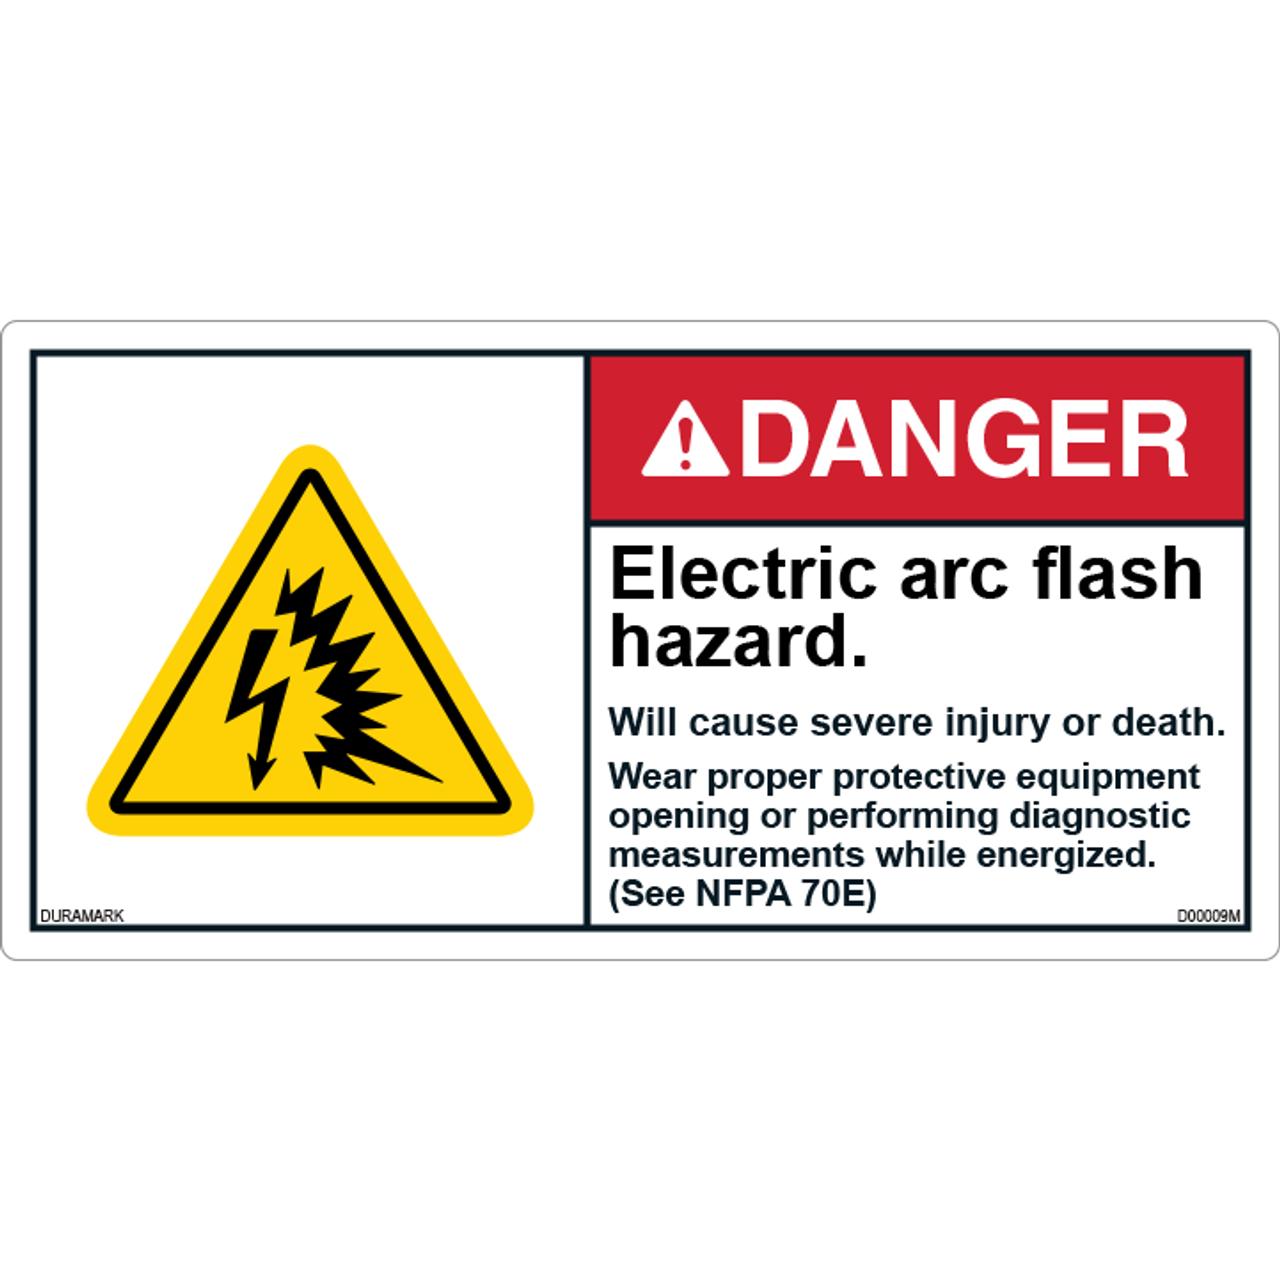 ANSI Safety Label - Danger - Electric Arc Flash Explosion - Injury or Death